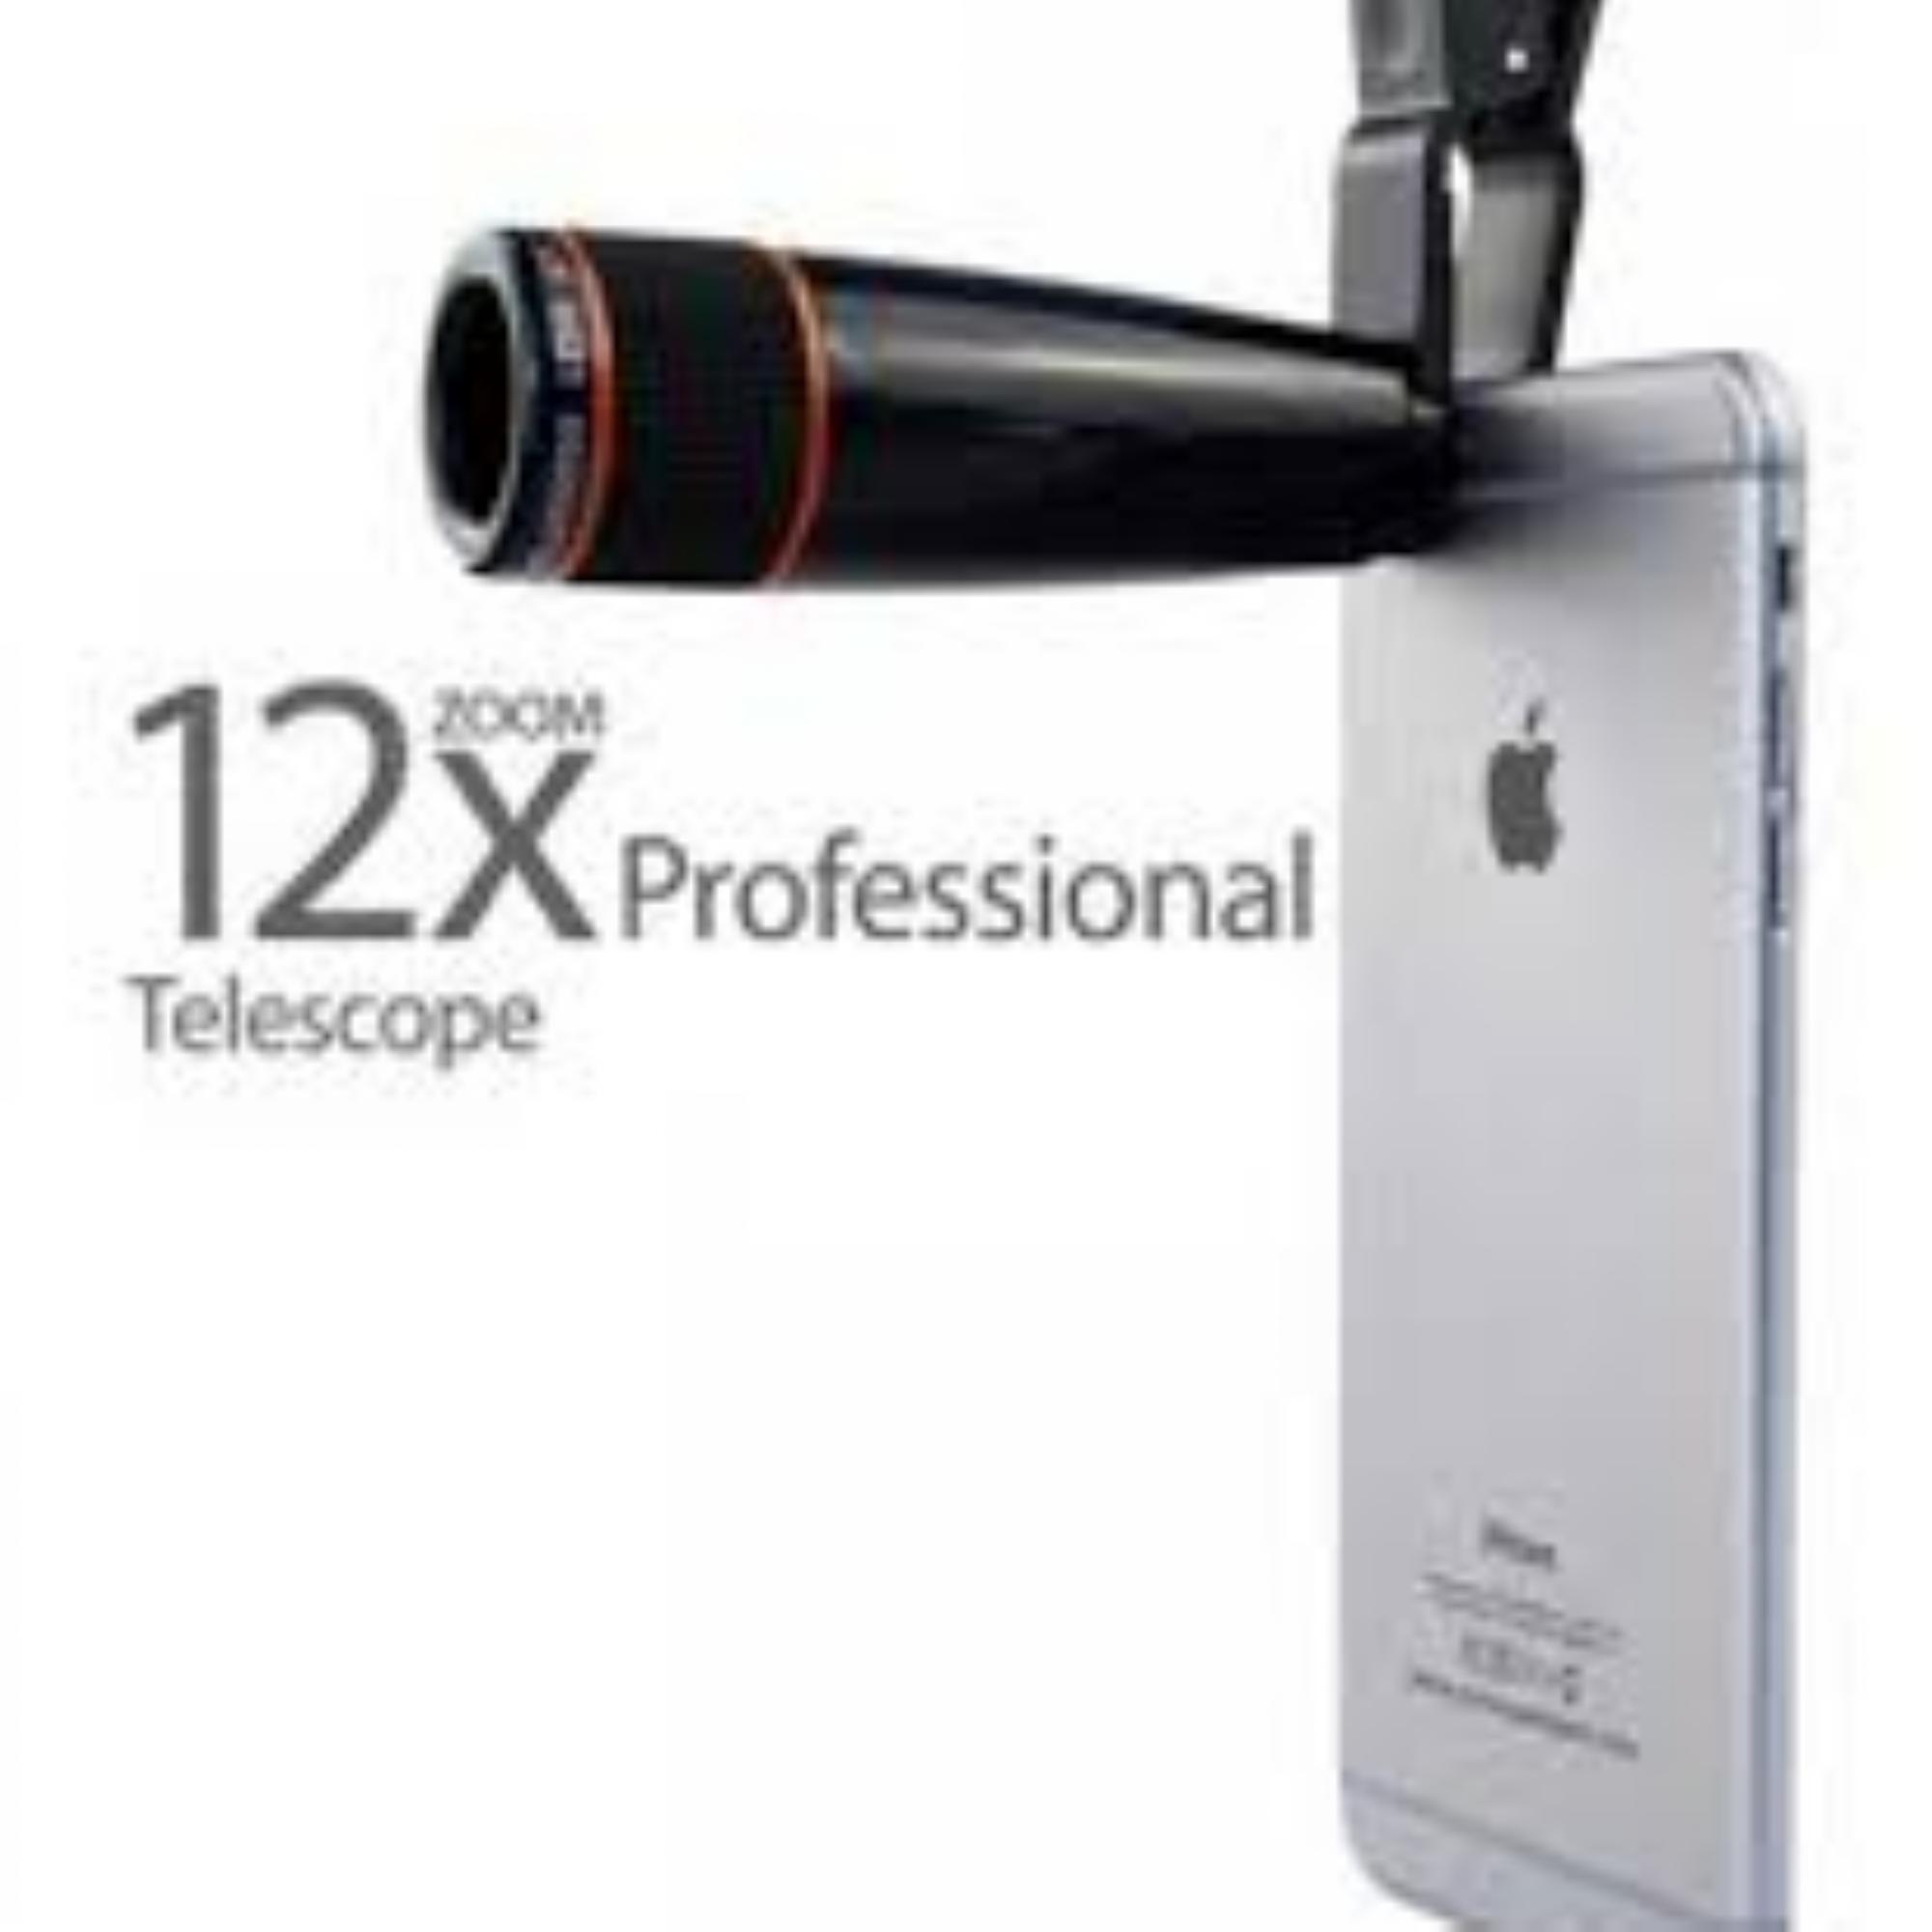 12x Zoom Lens Telescope For Smartphone